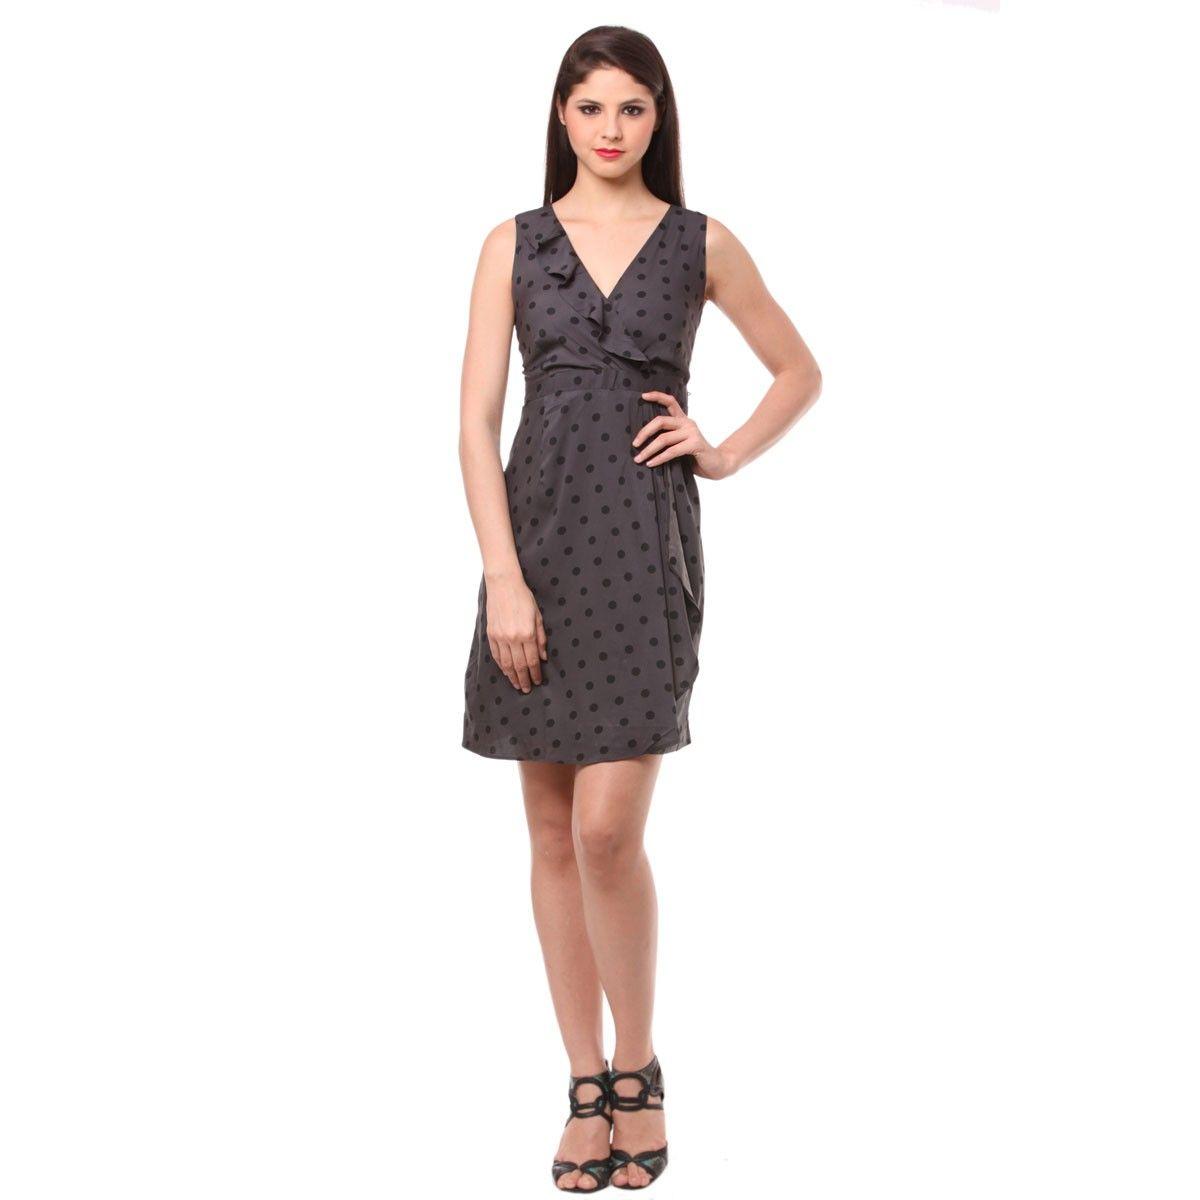 Crepe Dark Grey Polka Dot Print Wrap Dress - EF01090